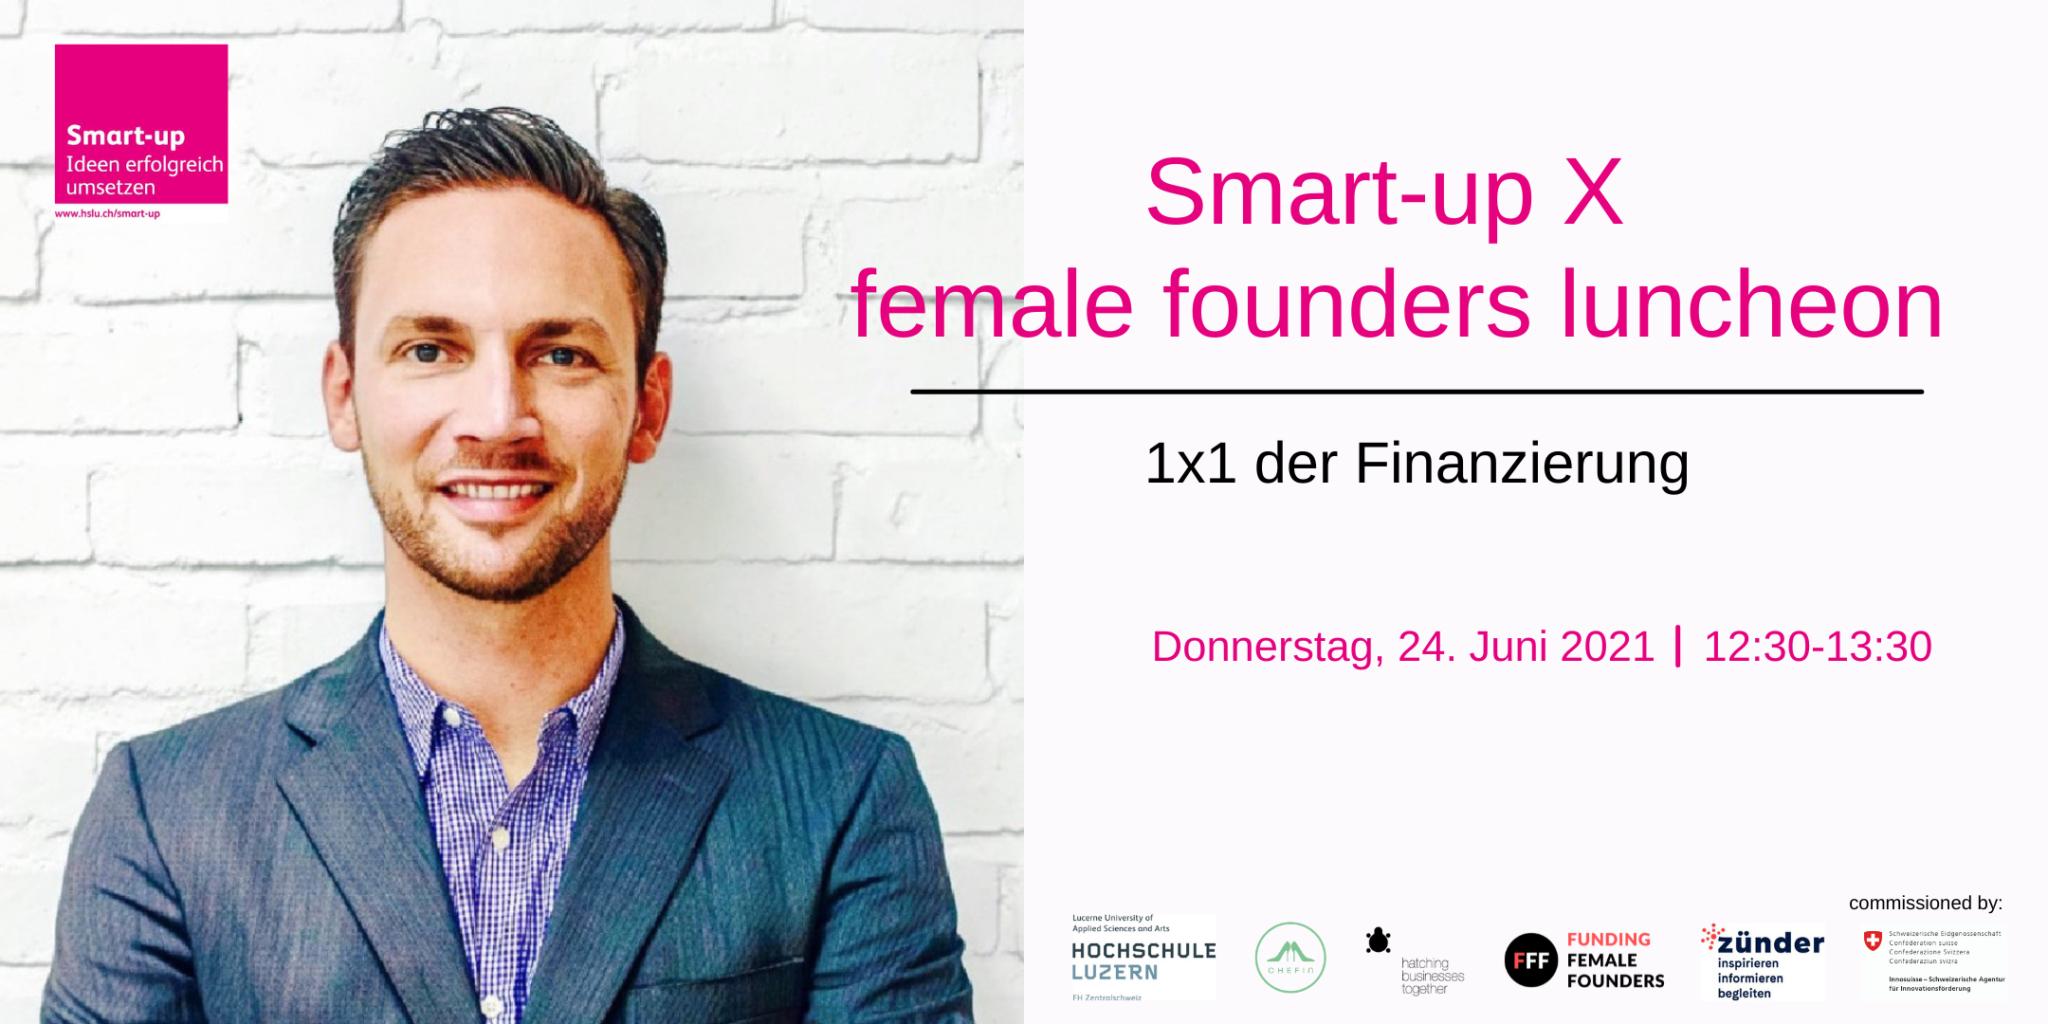 Smart-up X female founders luncheon – 1×1 der Finanzierung